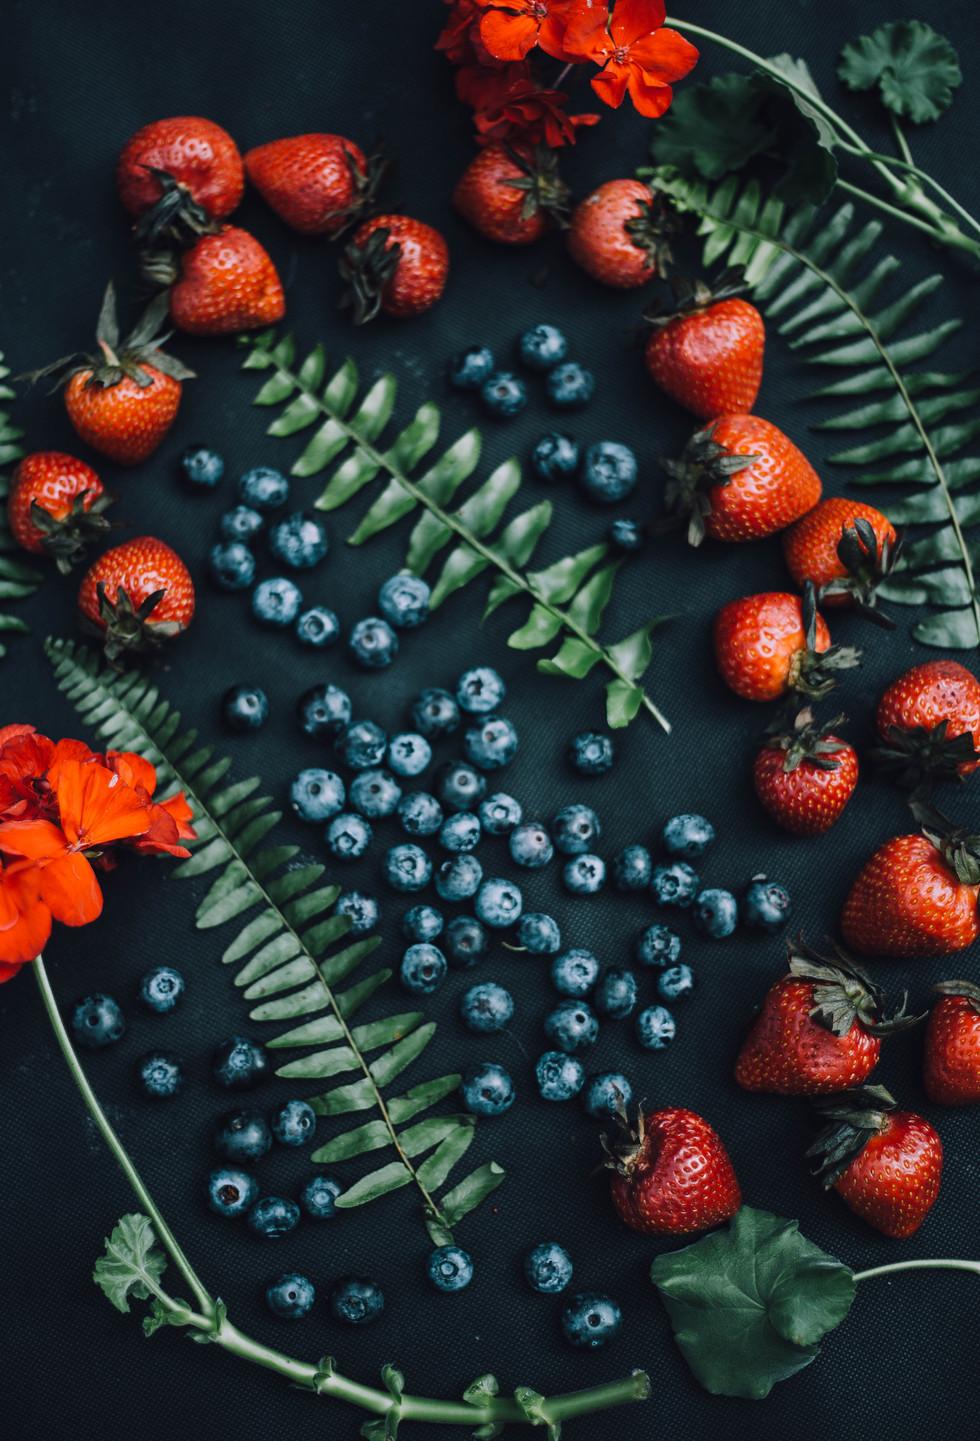 Still life food photo of berries